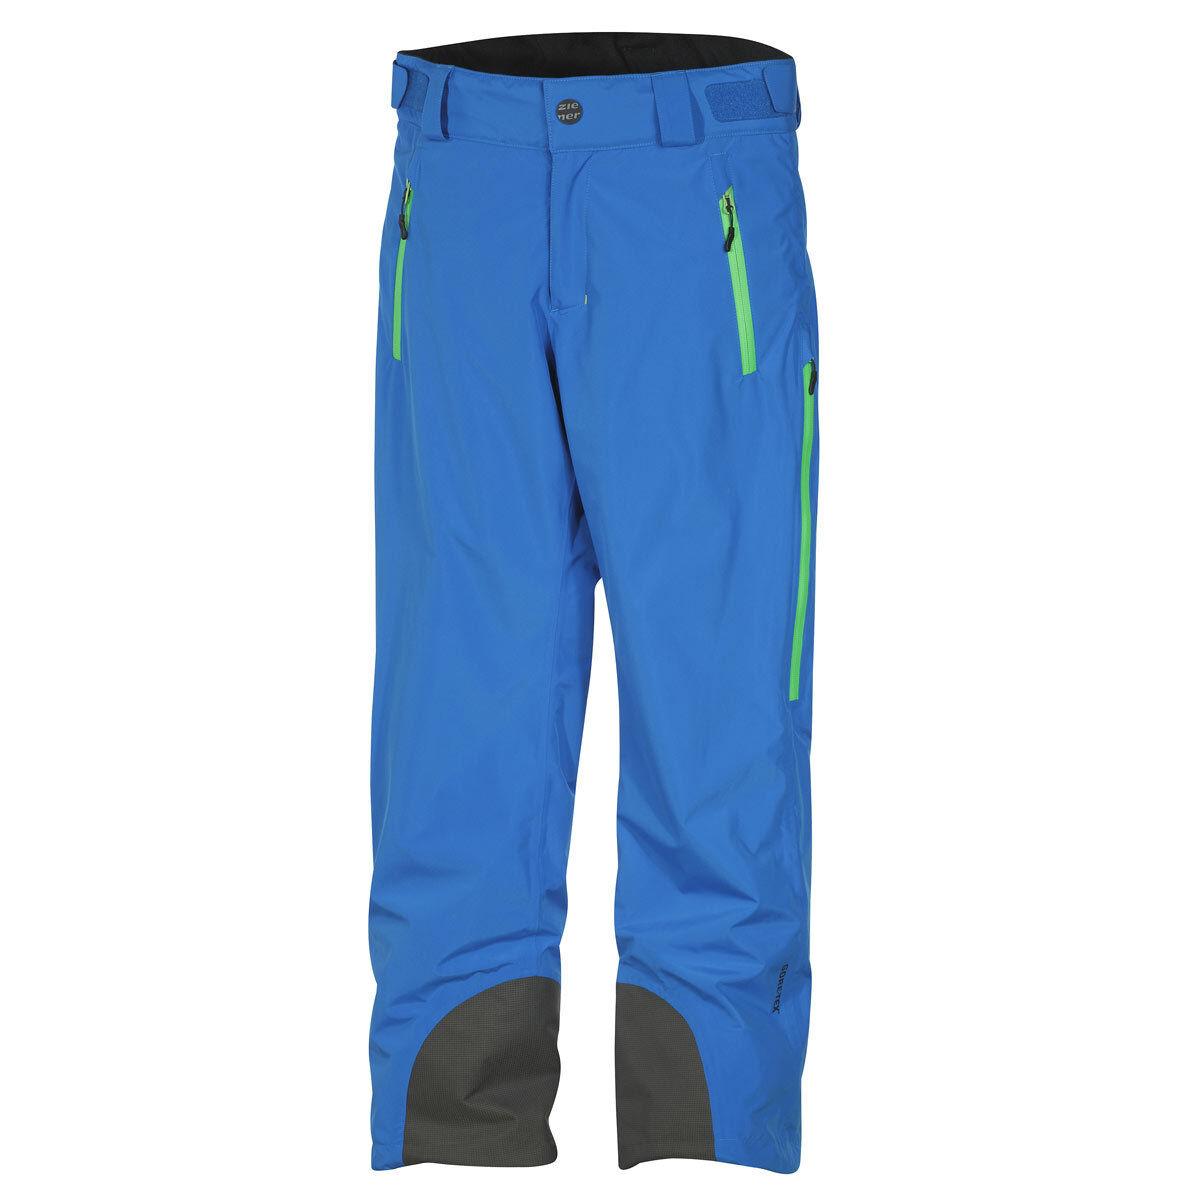 ZIENER RANDO GTX  Herren Skihose Snowboardhose GORE-TEX PRIMALOFT 144271